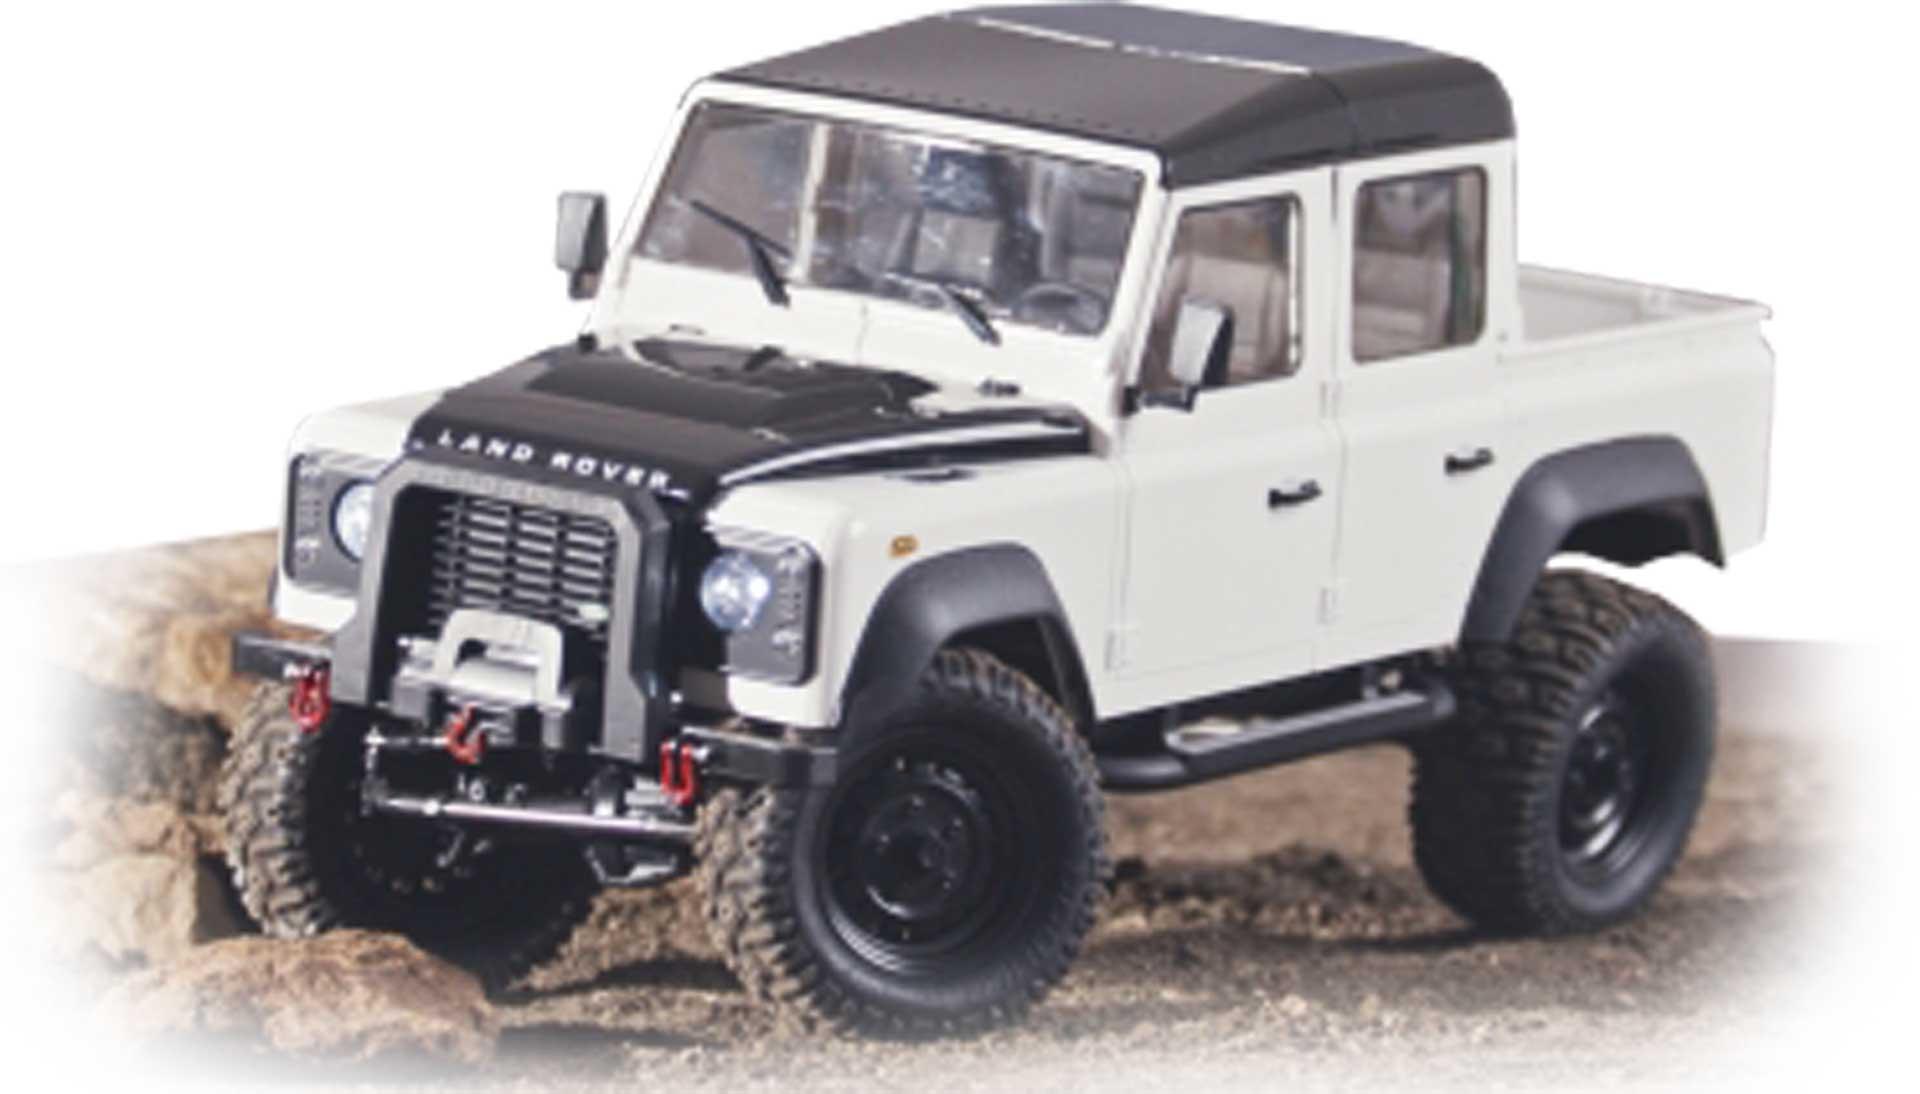 FM-ELECTRICS Landrover Defender Crawler Pickup 4WD 1:8 RTR EP